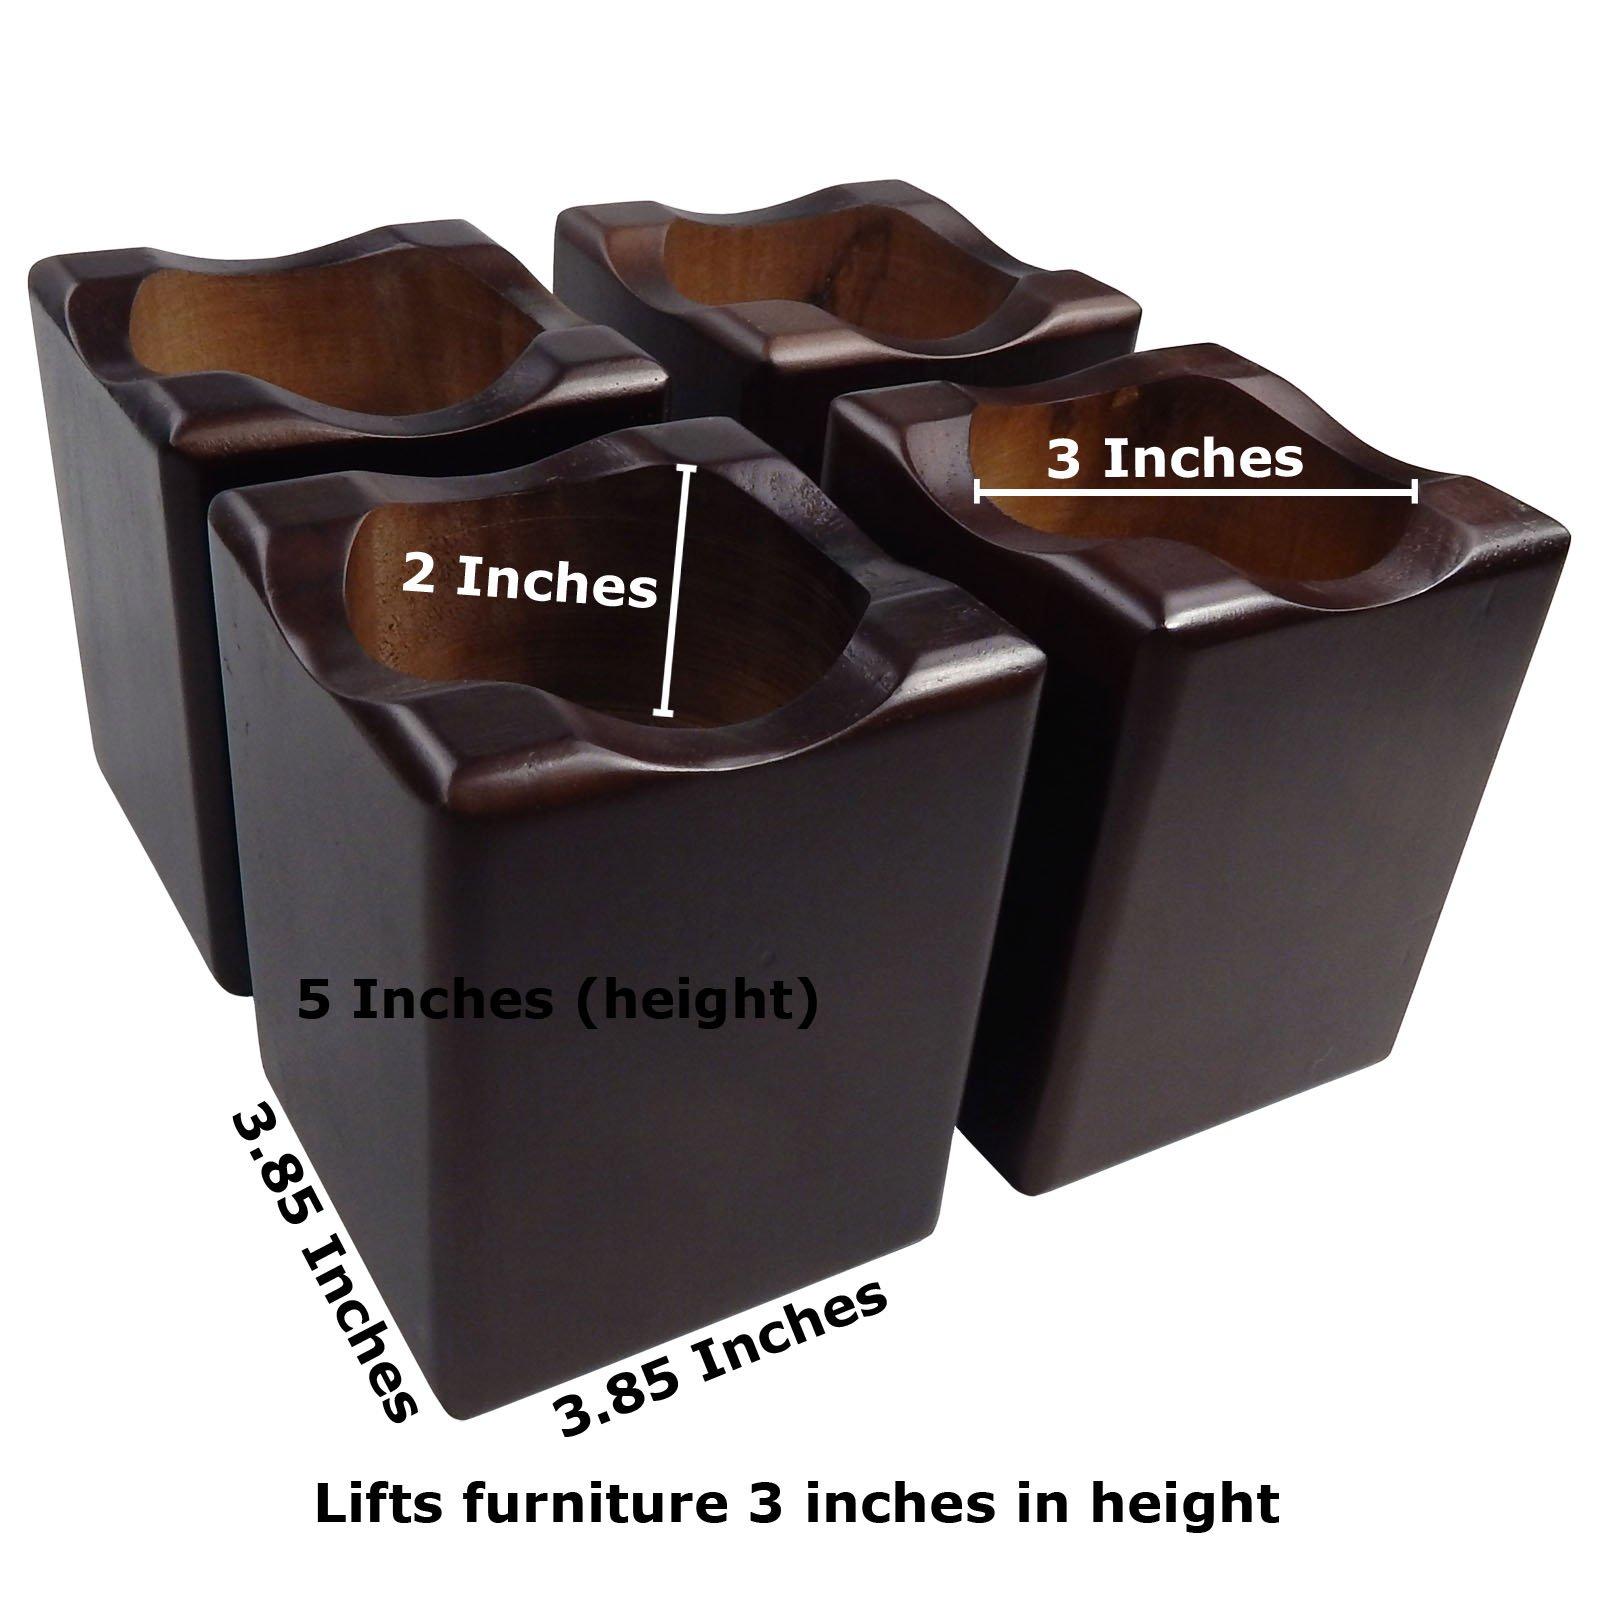 Tomokazu Ruckman Solid Wood in Walnut Finish 3 Inch Sofa, Table, Bed Riser/Furniture Lifter (Set of 4) by Tomokazu (Image #1)